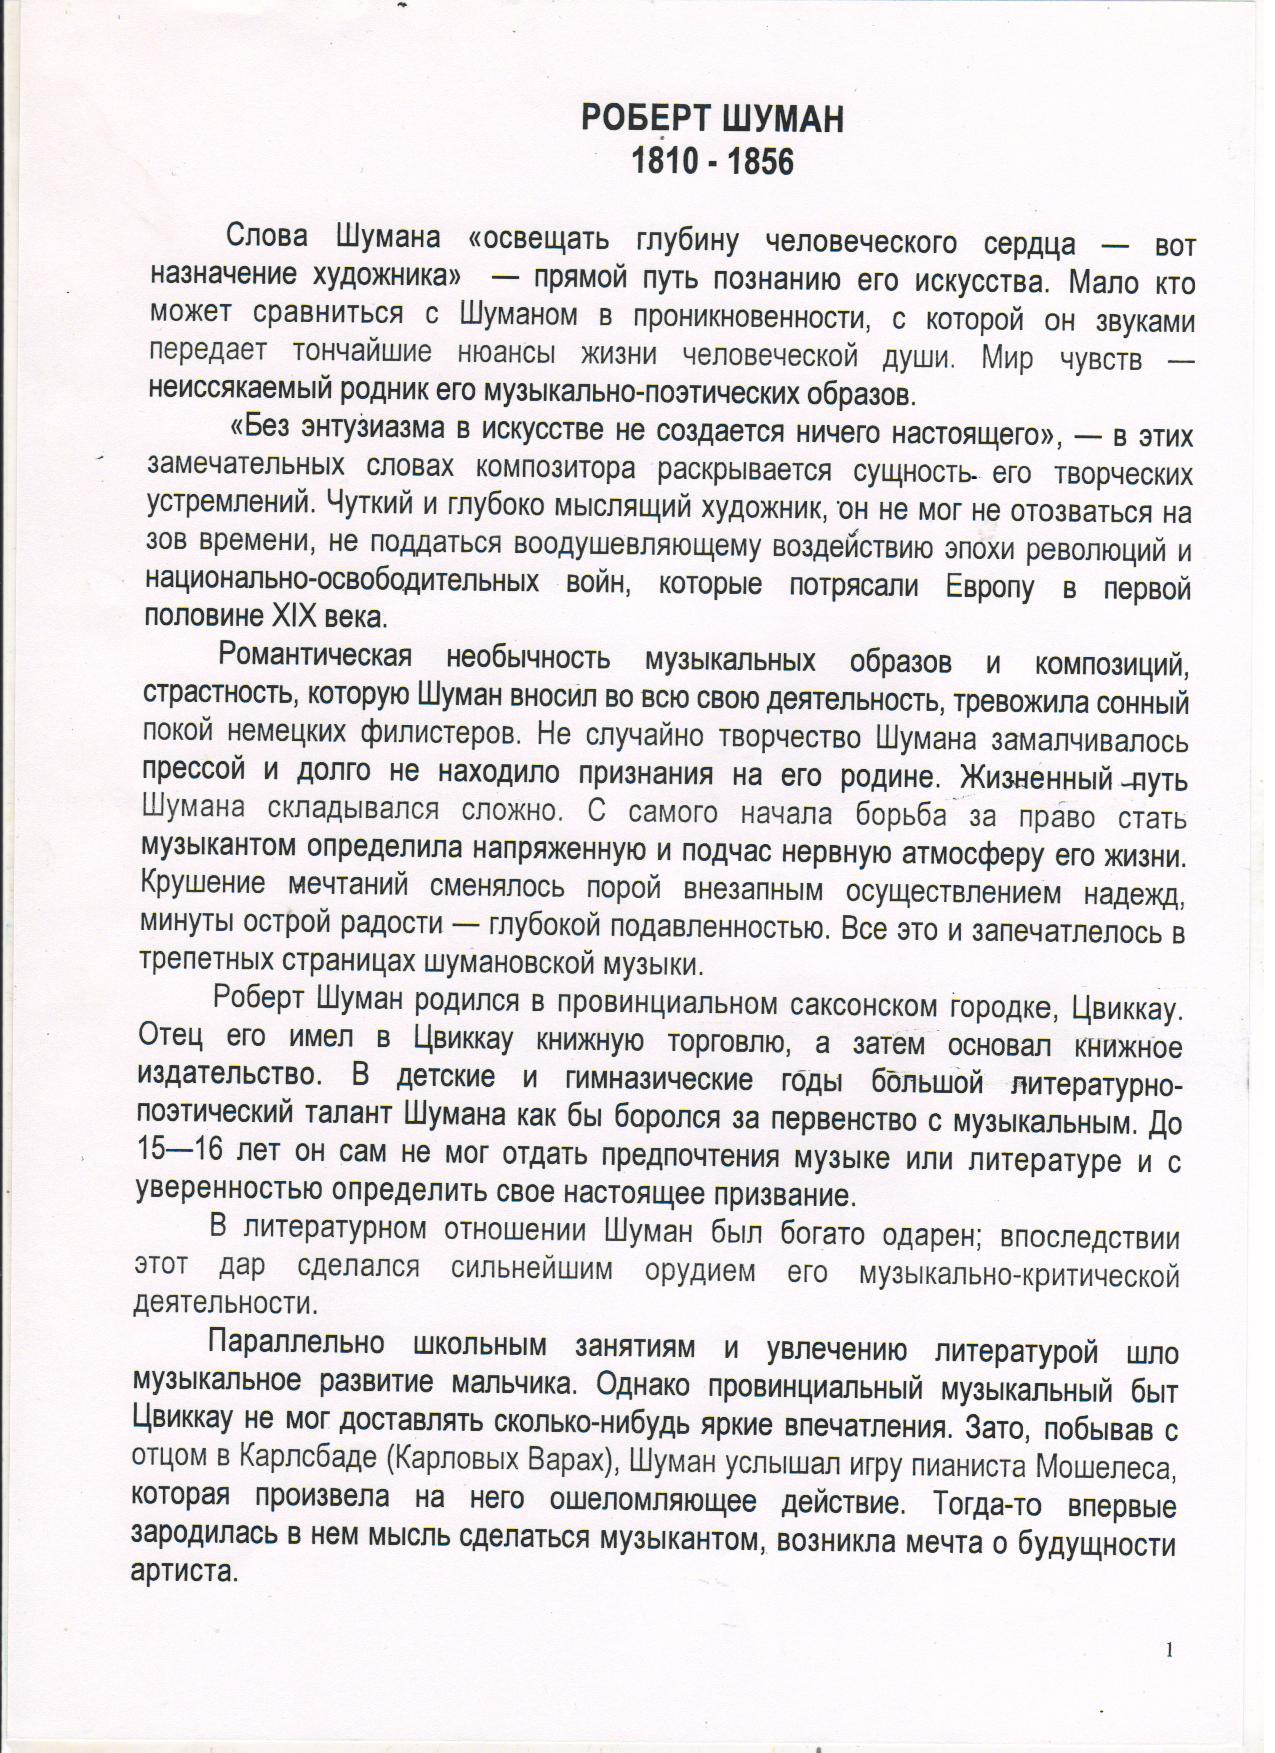 C:\Documents and Settings\Учитель\Рабочий стол\Шуман 1.jpg